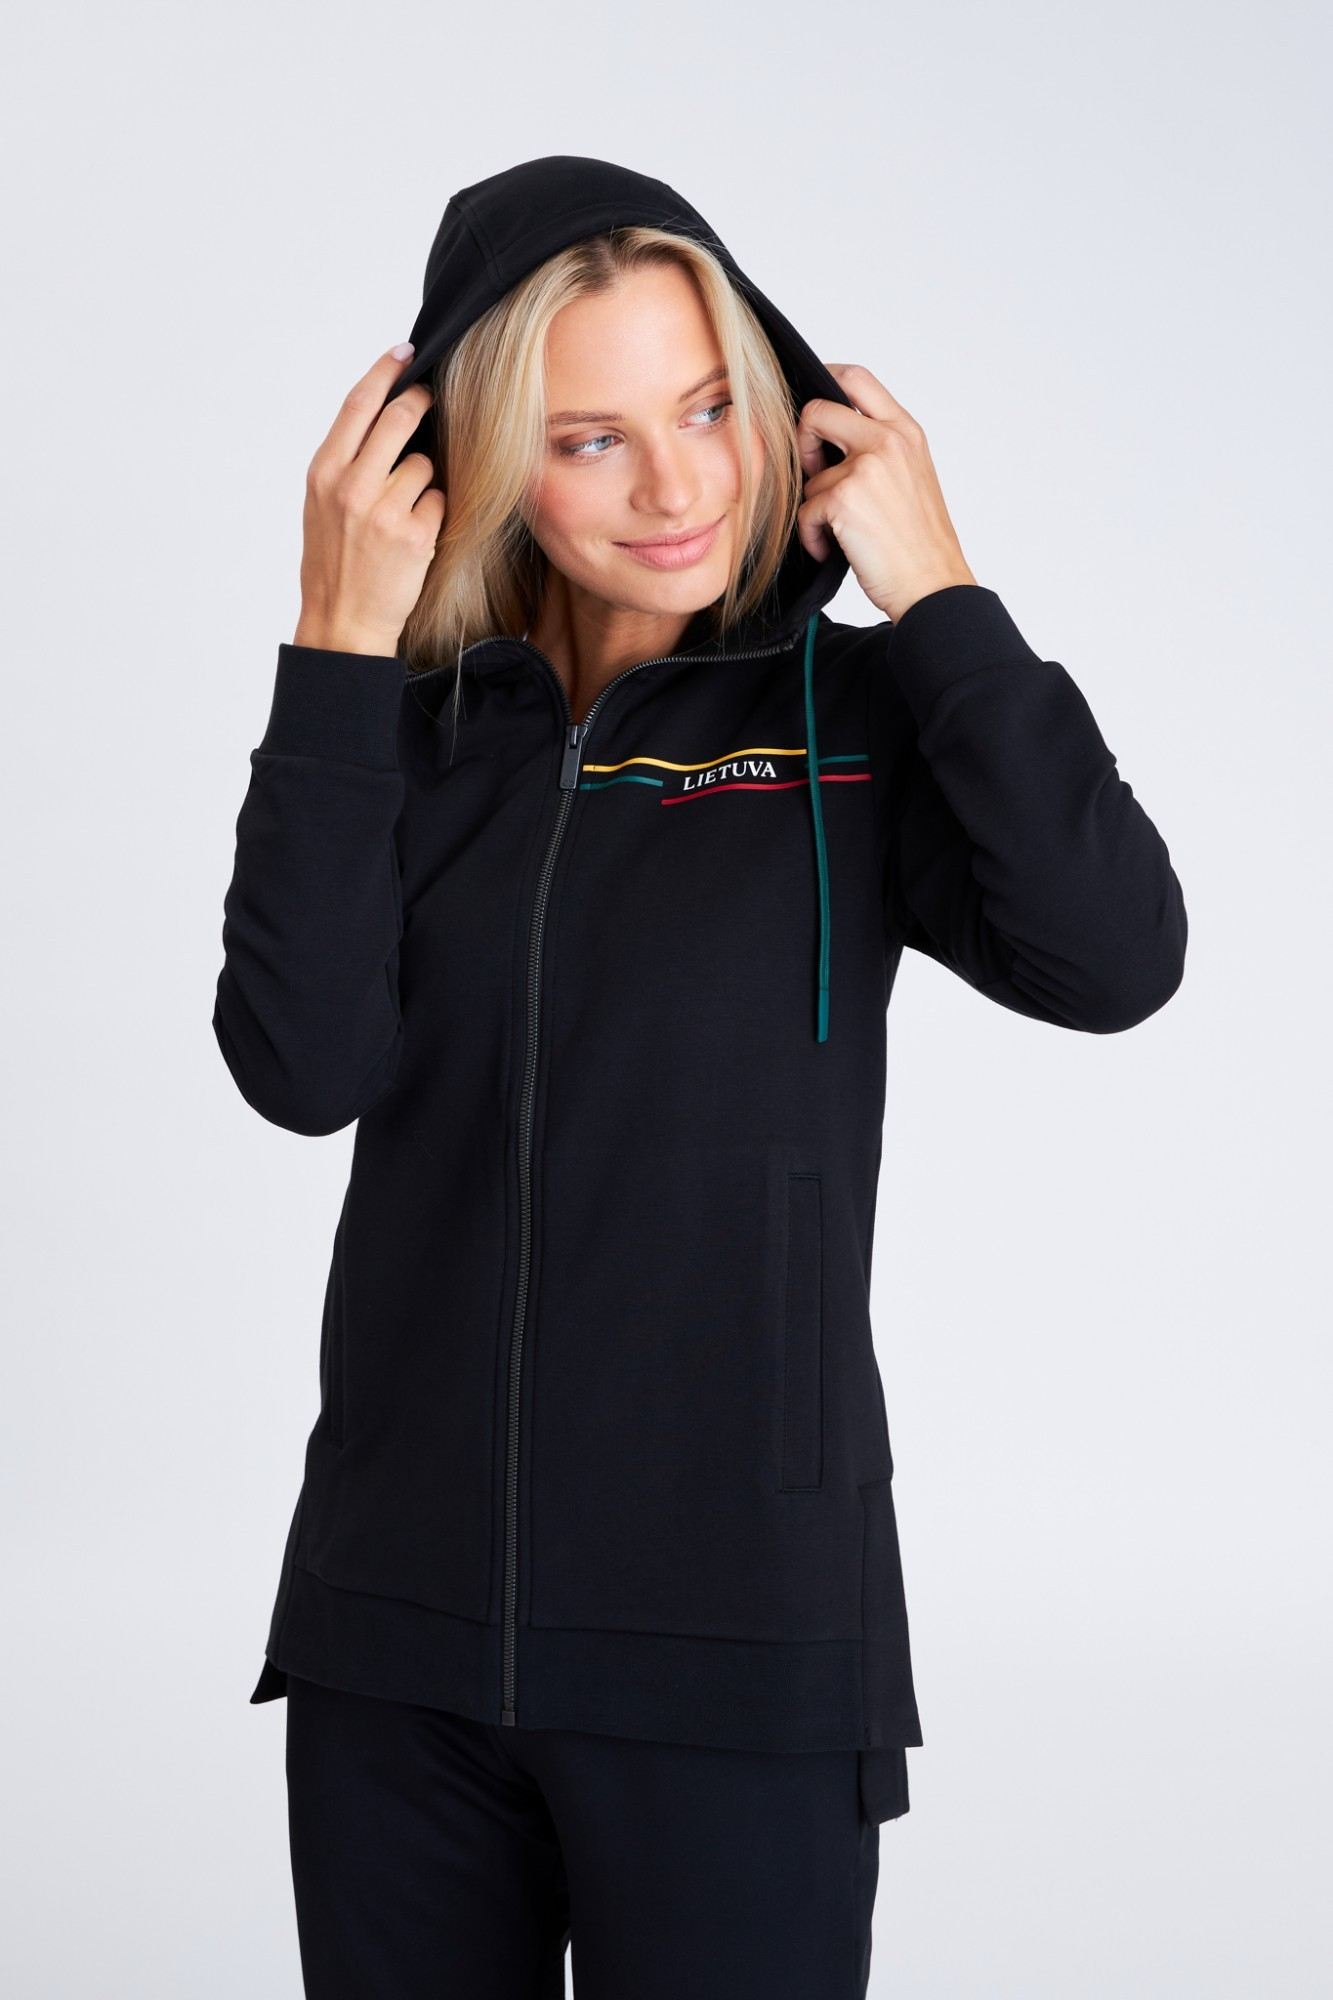 AUDIMAS Tamprus medvilninis džemperis 21LT-007 Black L